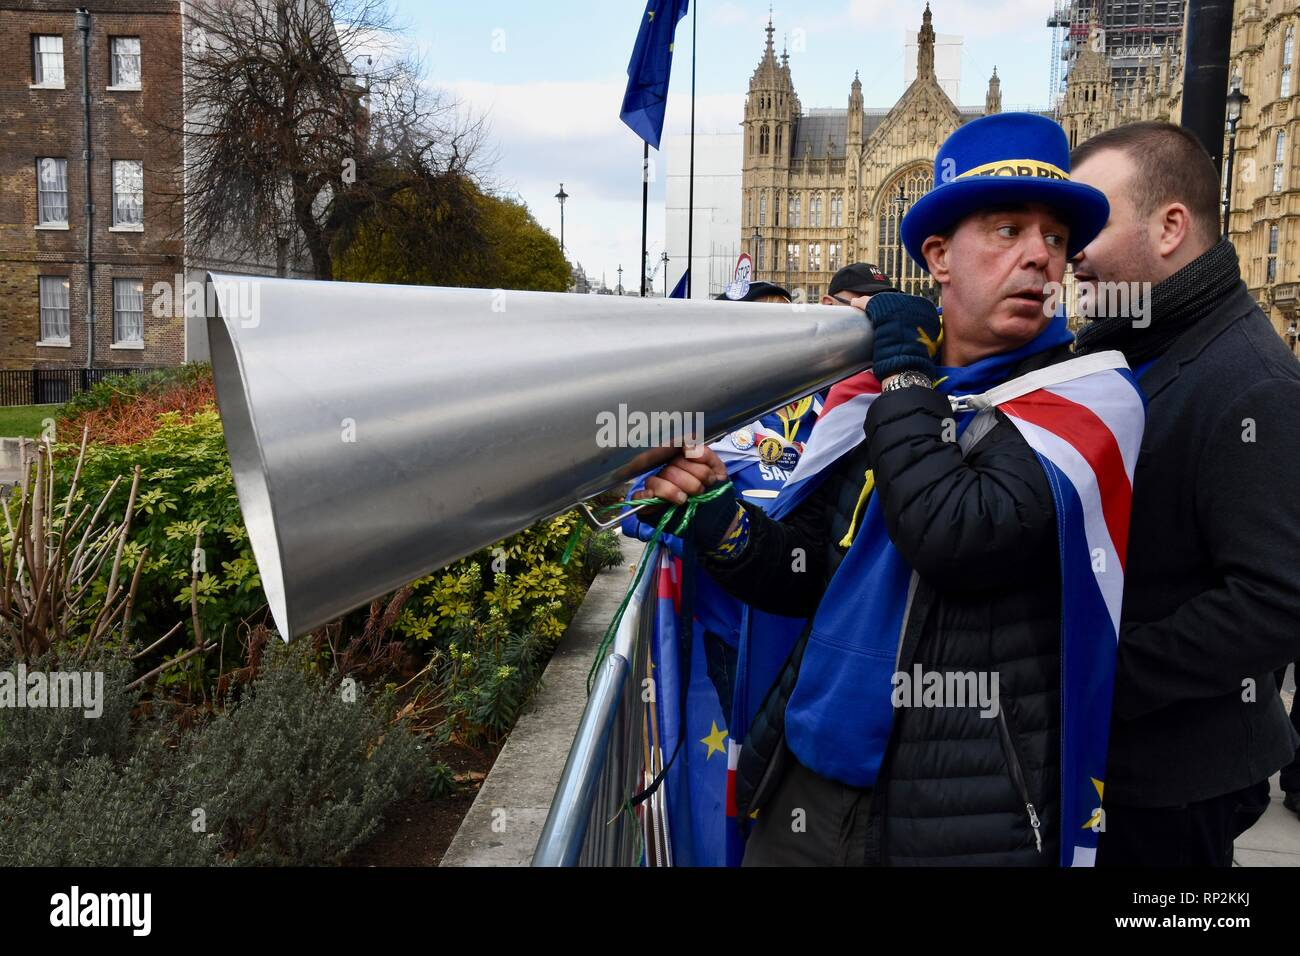 London, UK. 20th Feb, 2019. Steve Bray,Activist,SODEM Demonstration,College Green,Houses of Parliament,Westminster,London.UK Credit: michael melia/Alamy Live News - Stock Image